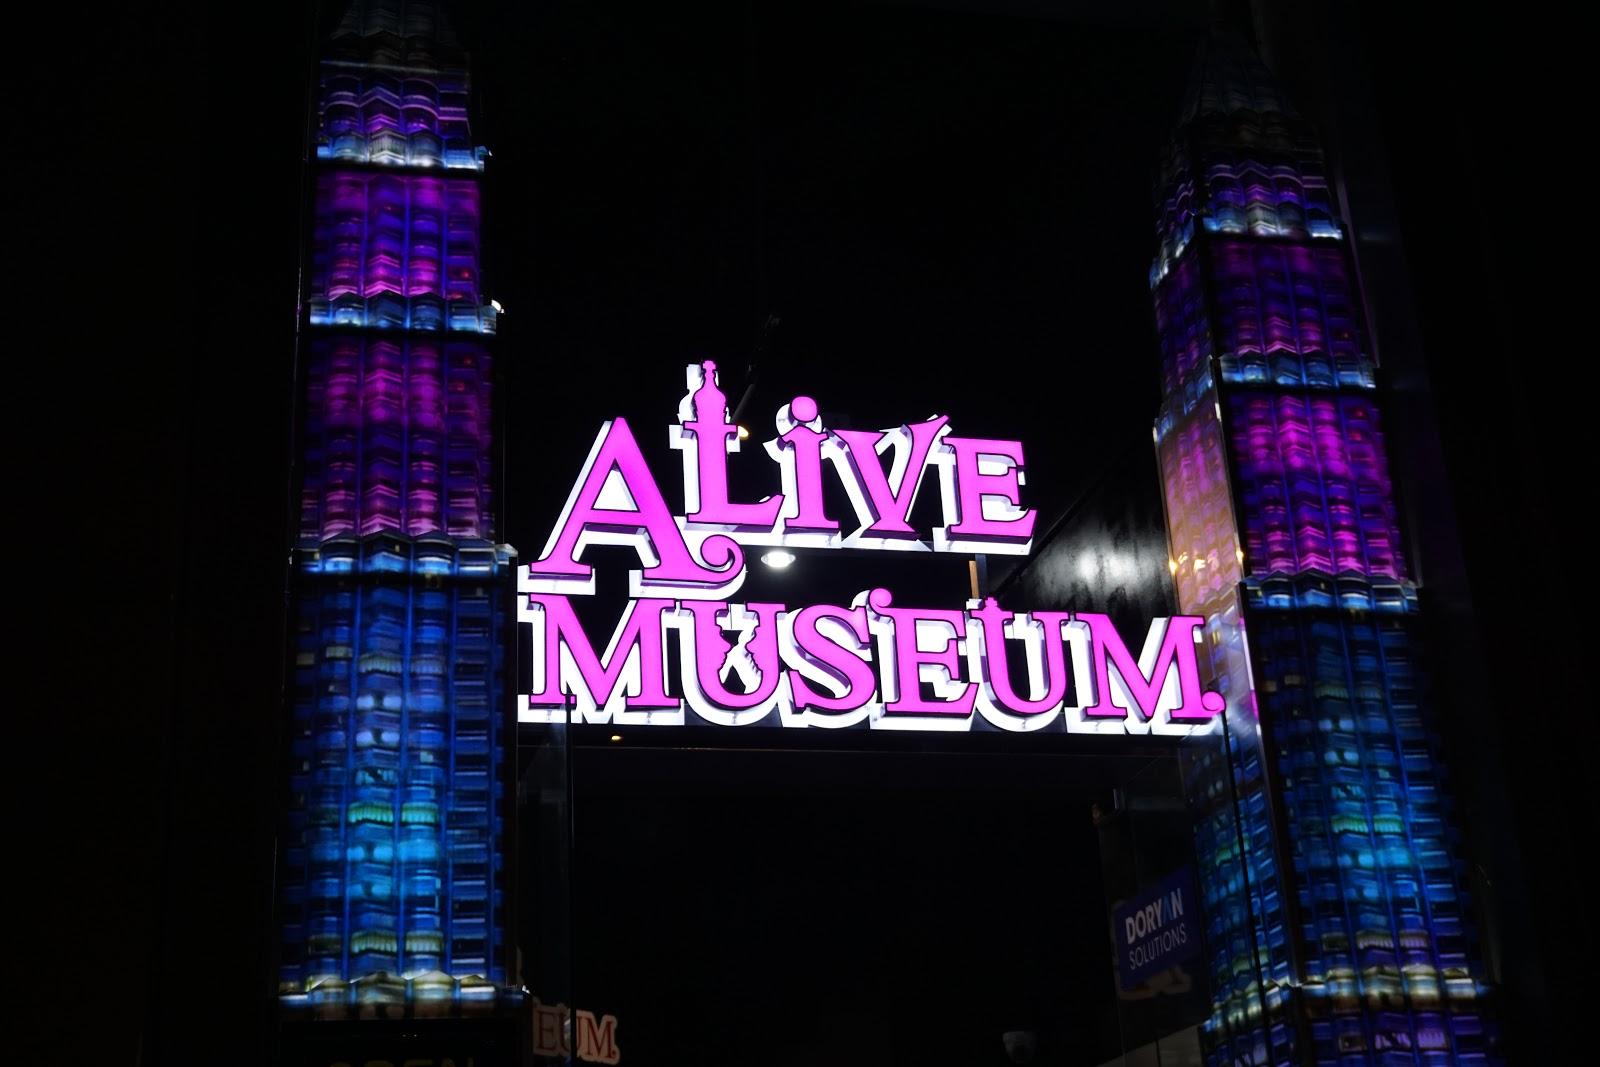 ALIVE MUSEUM GENTING